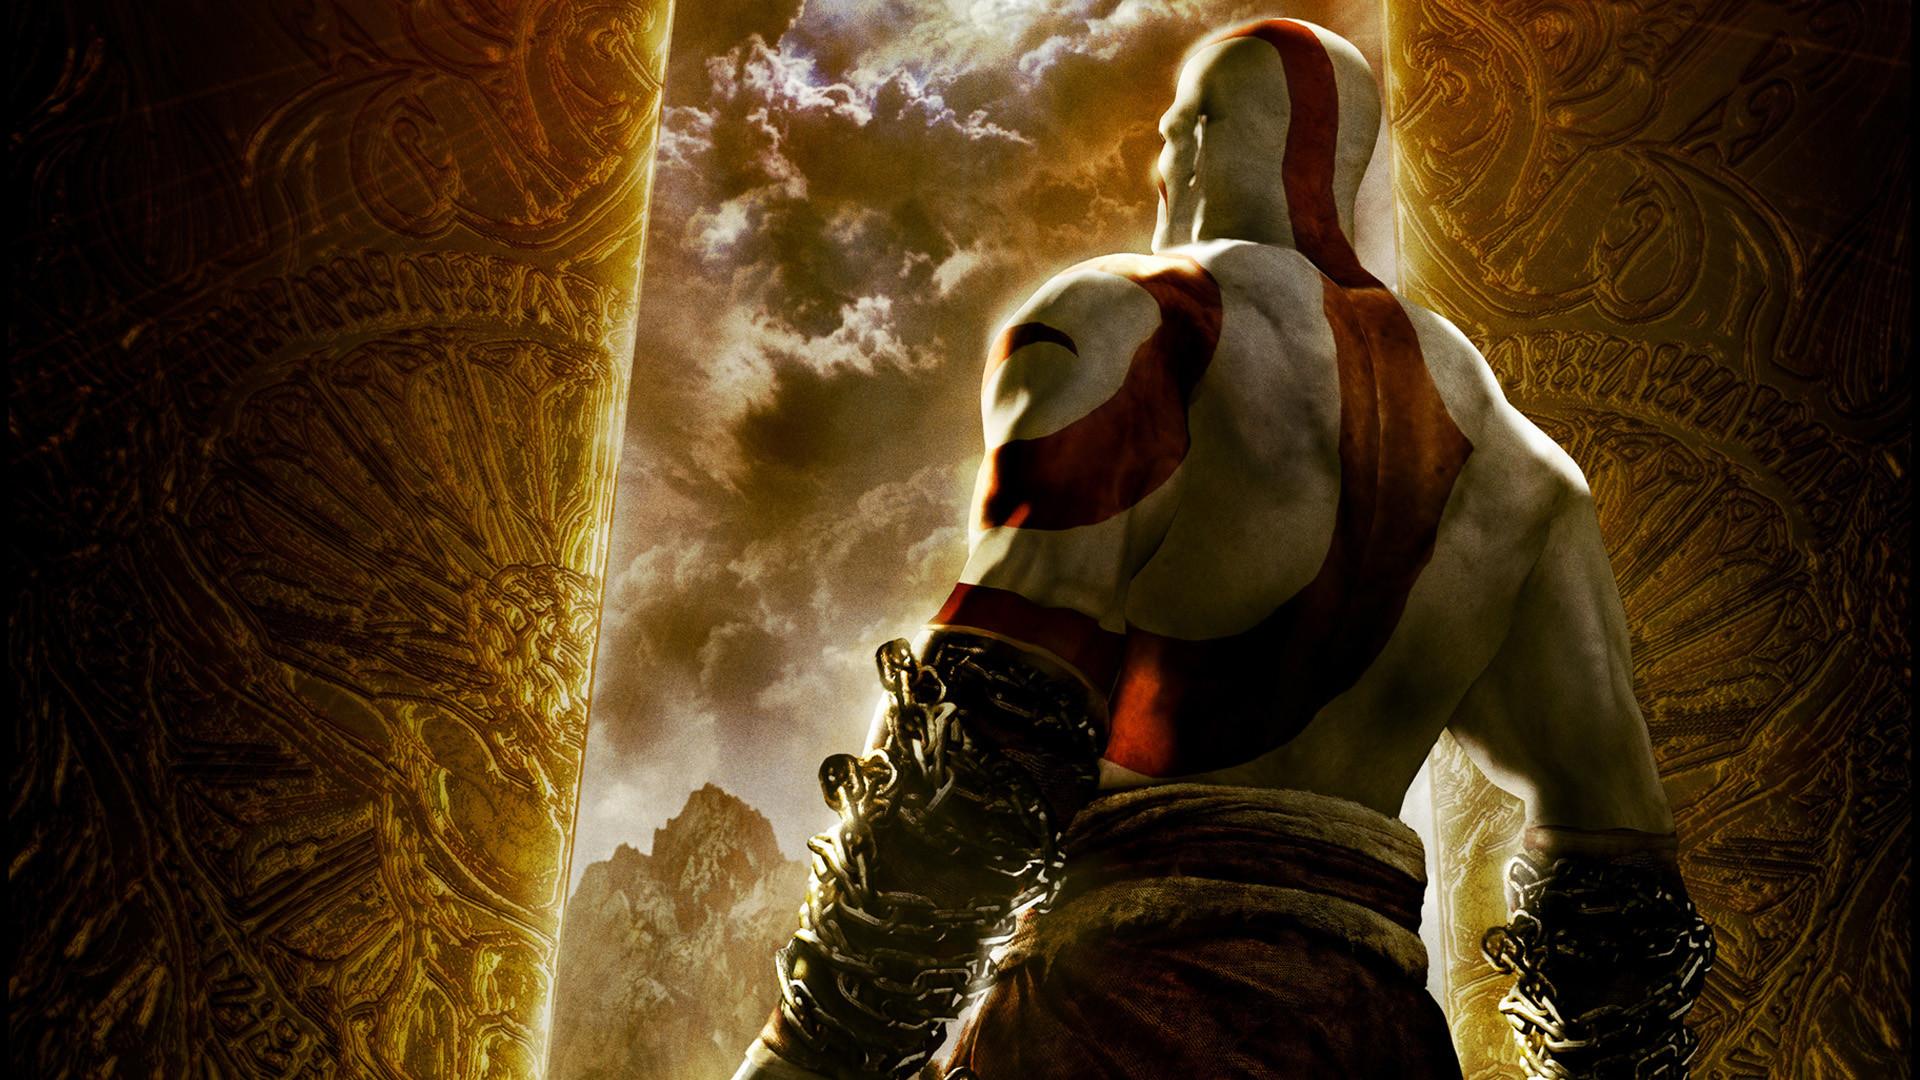 God Of War - God Of War (2010) - HD Wallpaper